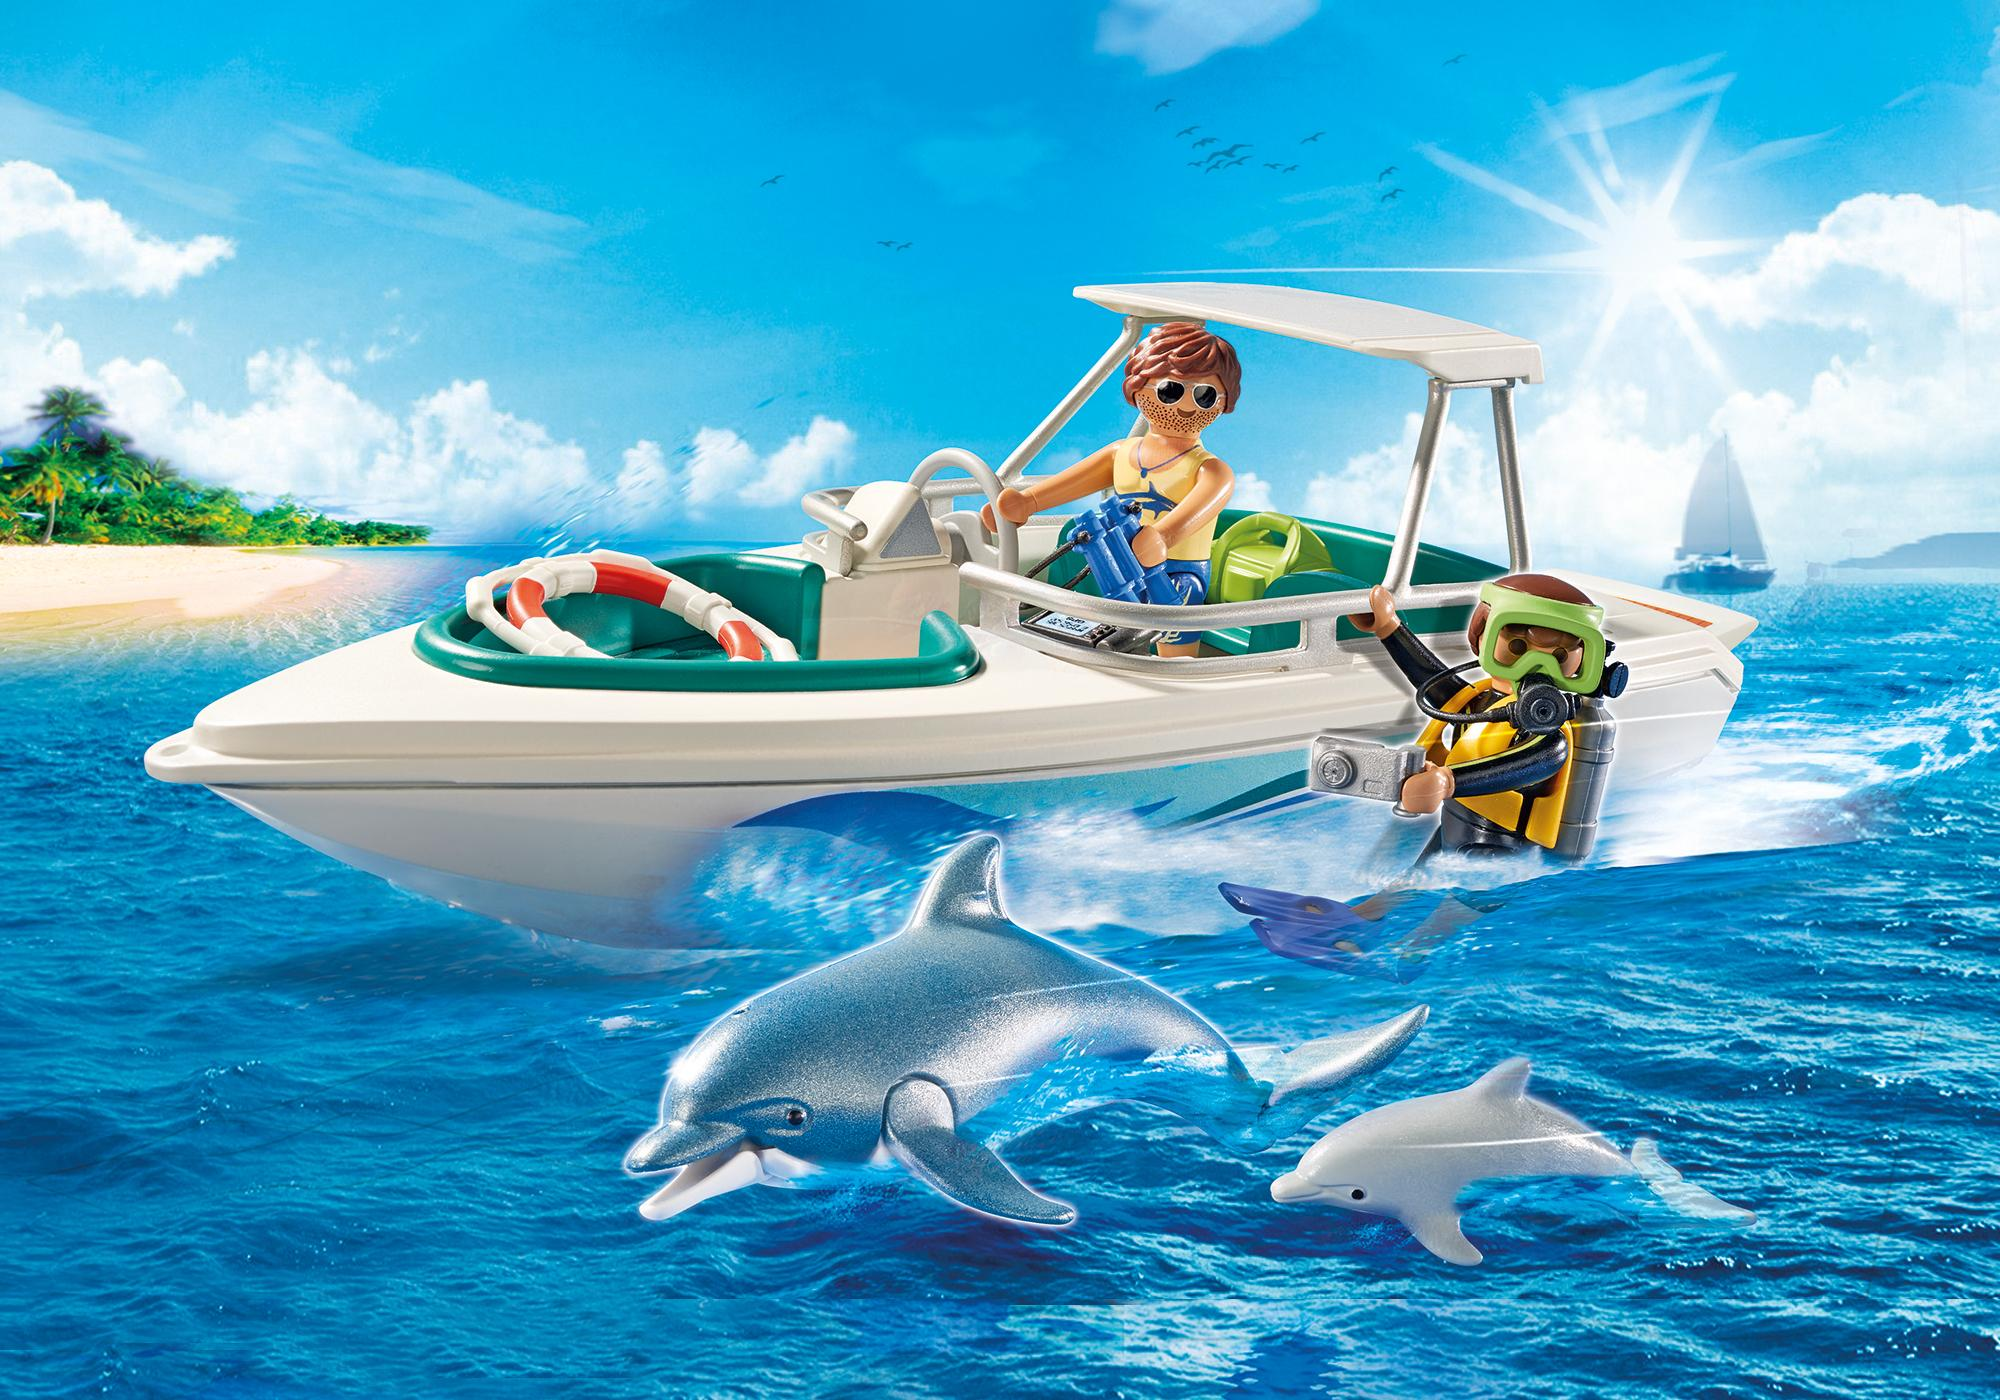 6981_product_detail/Tauchausflug mit Sportboot